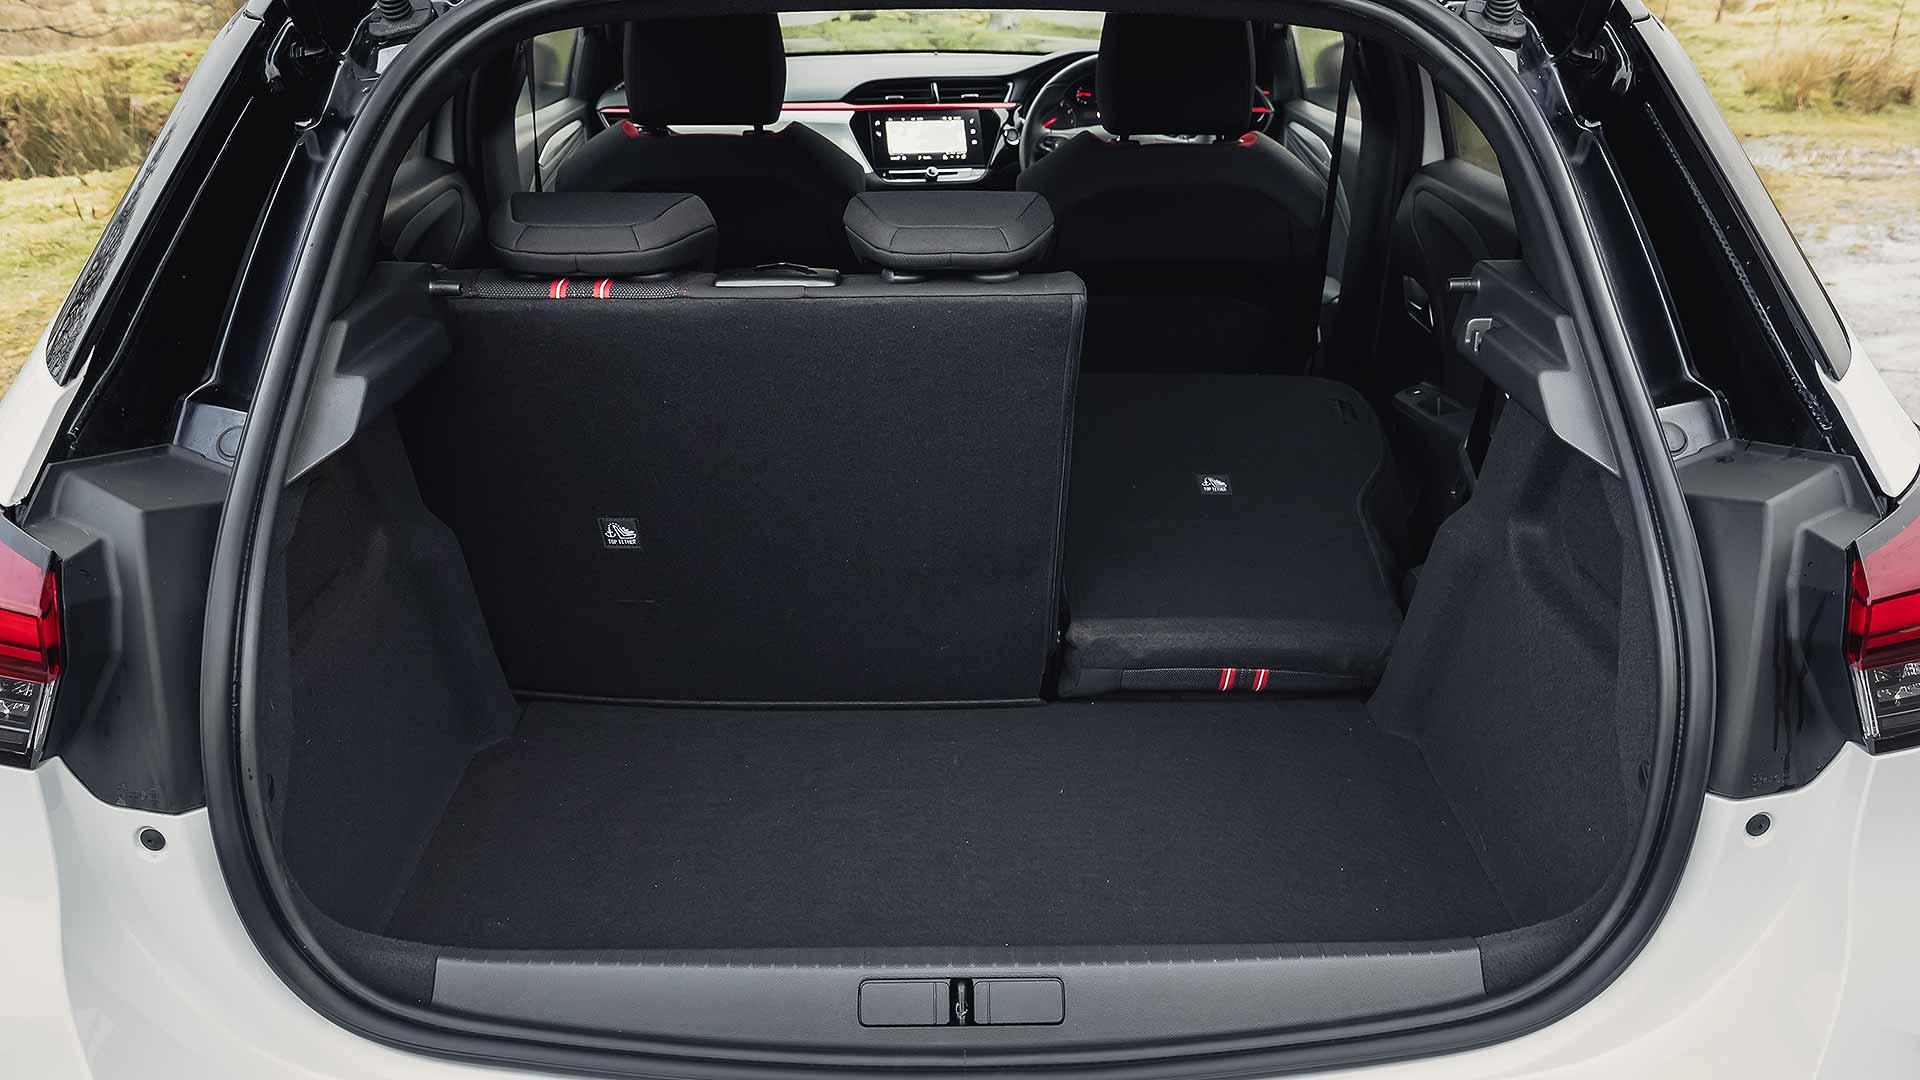 2020 Vauxhall Corsa SRi